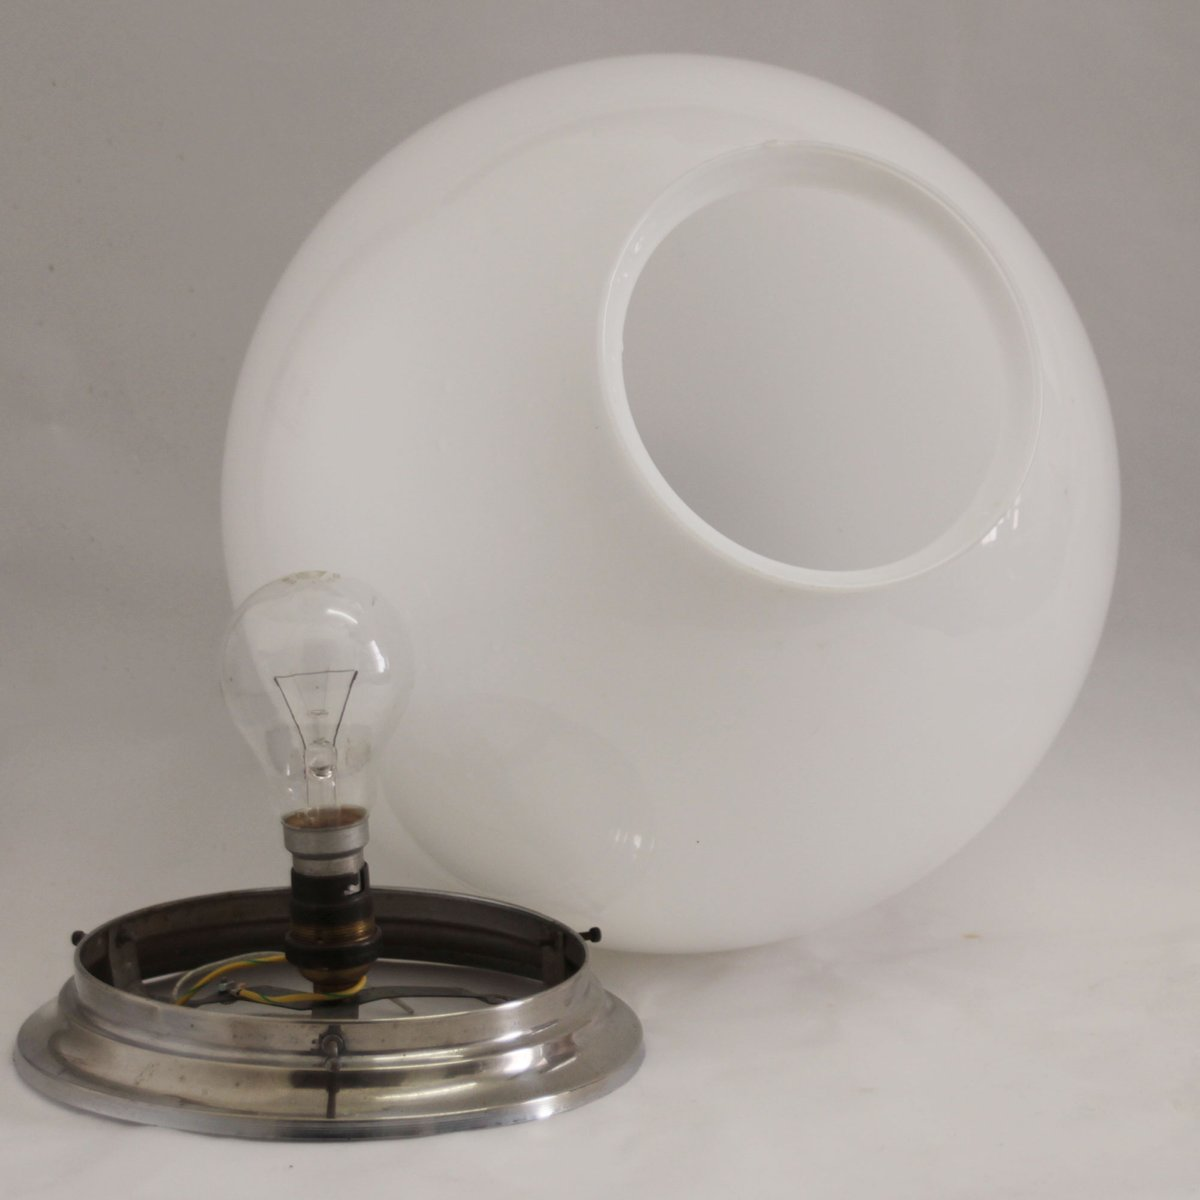 plafonnier art d co vintage en m tal verre opalin france en vente sur pamono. Black Bedroom Furniture Sets. Home Design Ideas